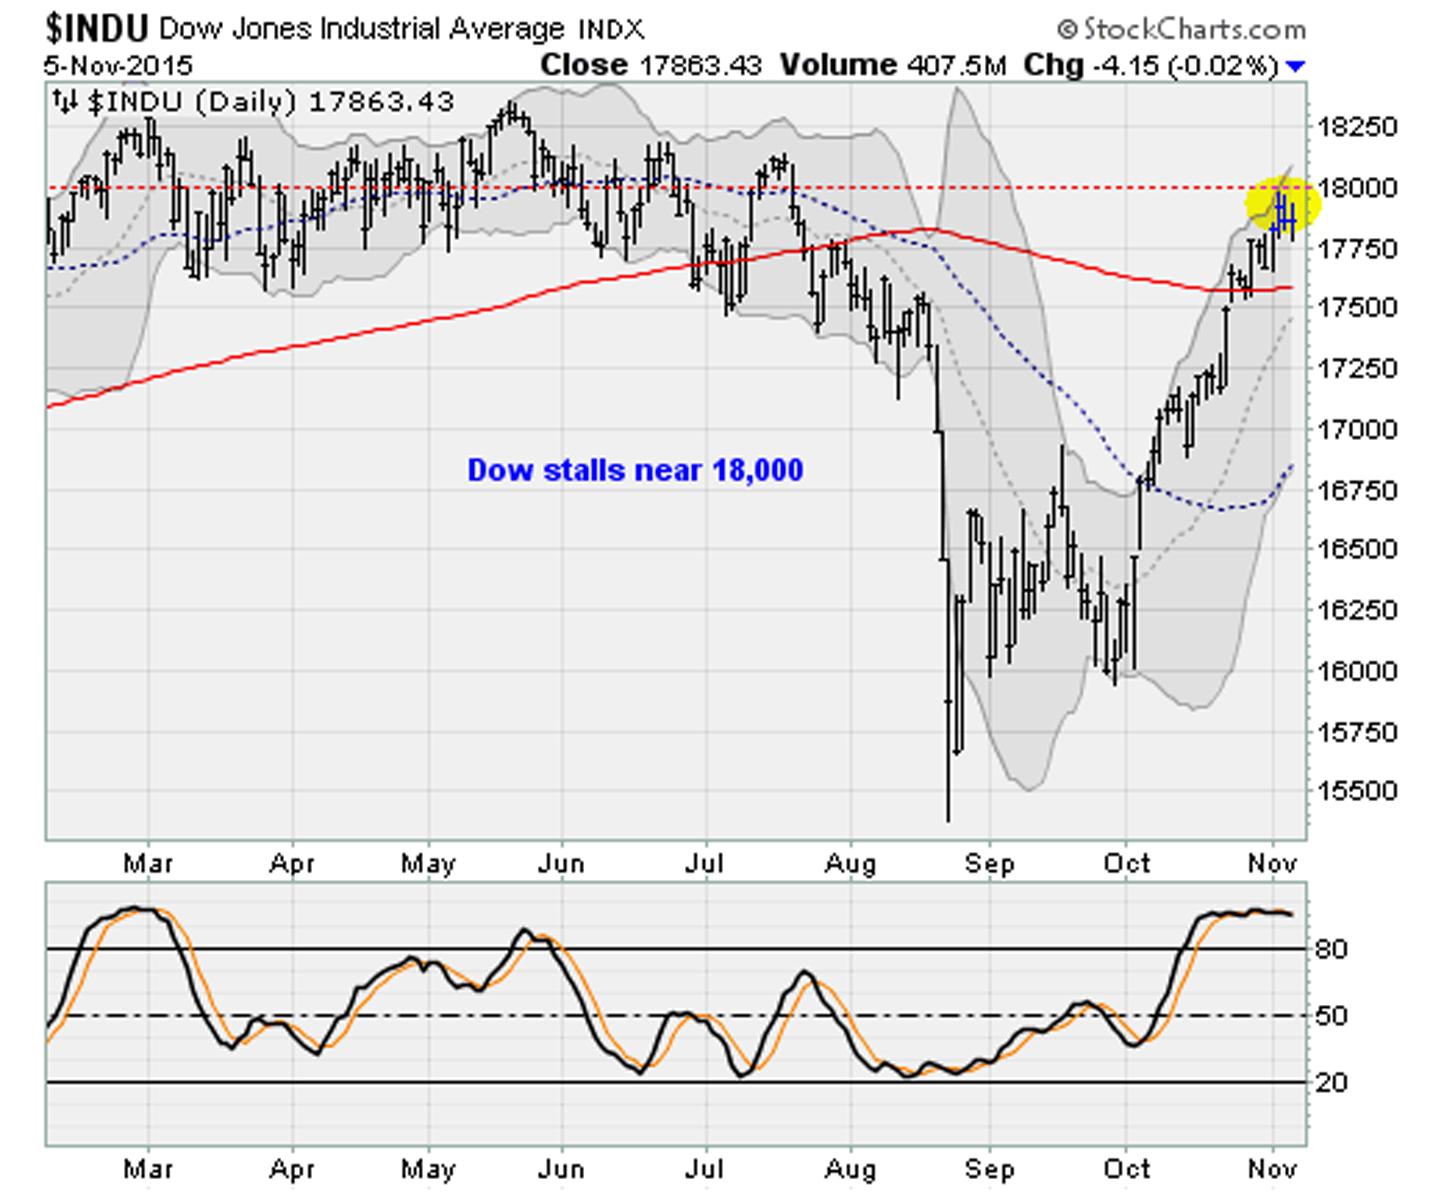 11 05 15 DJIA Stocks Mixed Ahead of Fridays Jobs Report